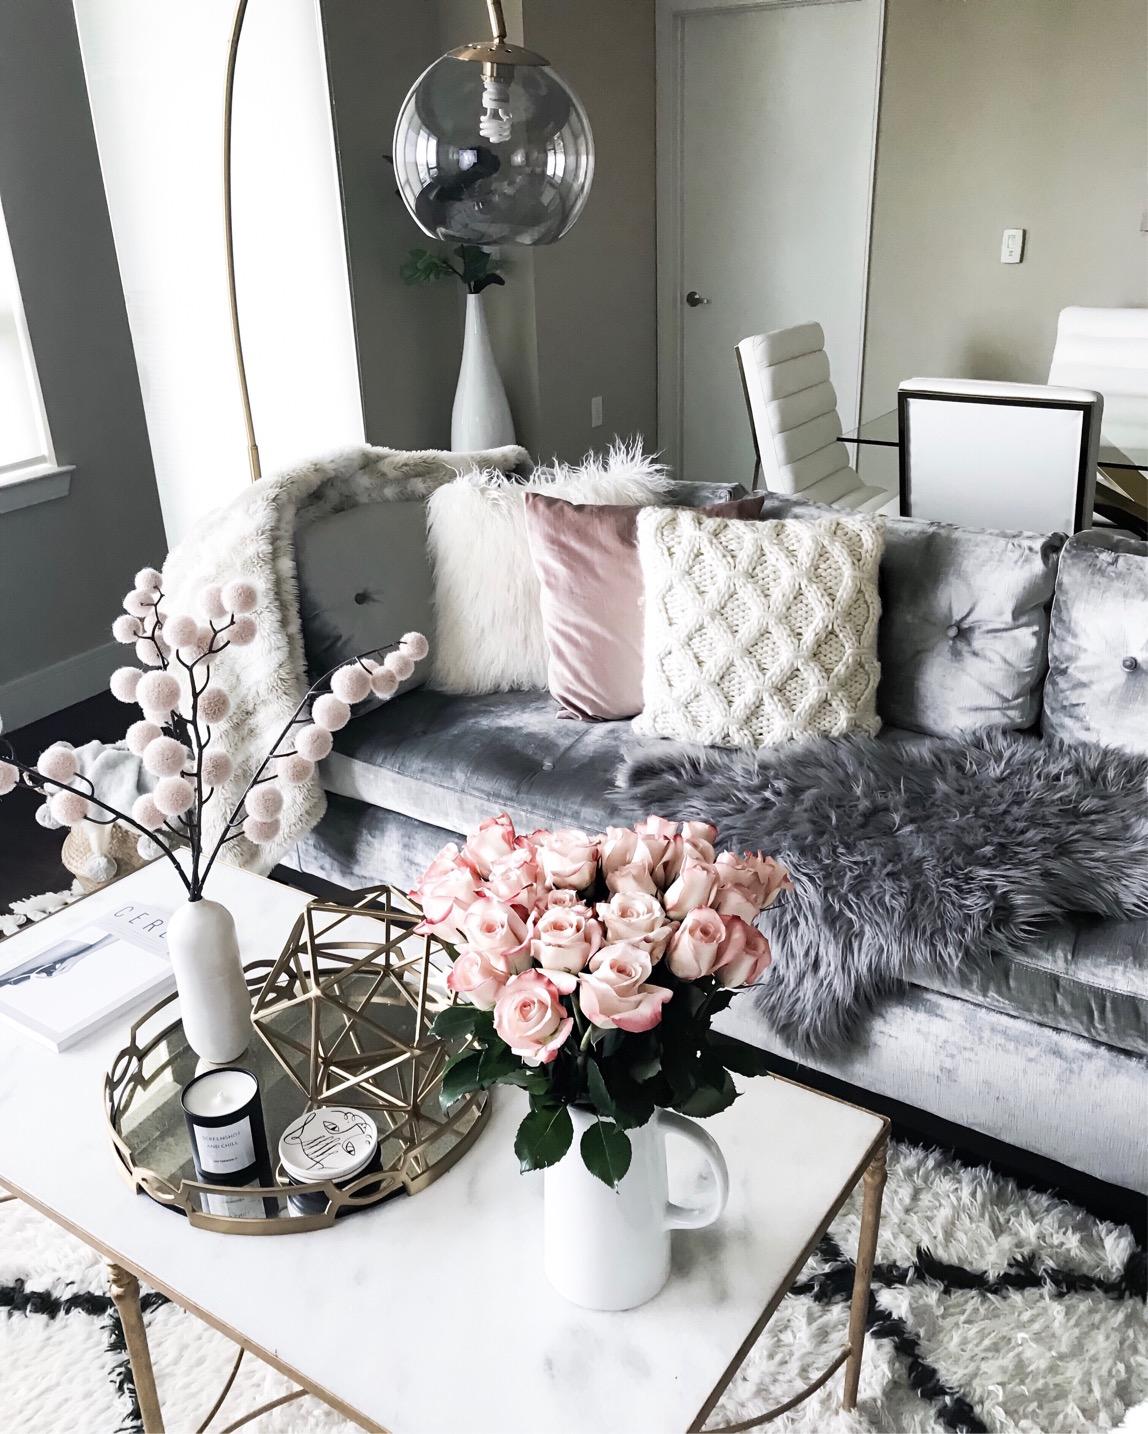 Tiffany Jais Houston fashion and lifestyle blogger | Home decor, scandinavian interiors